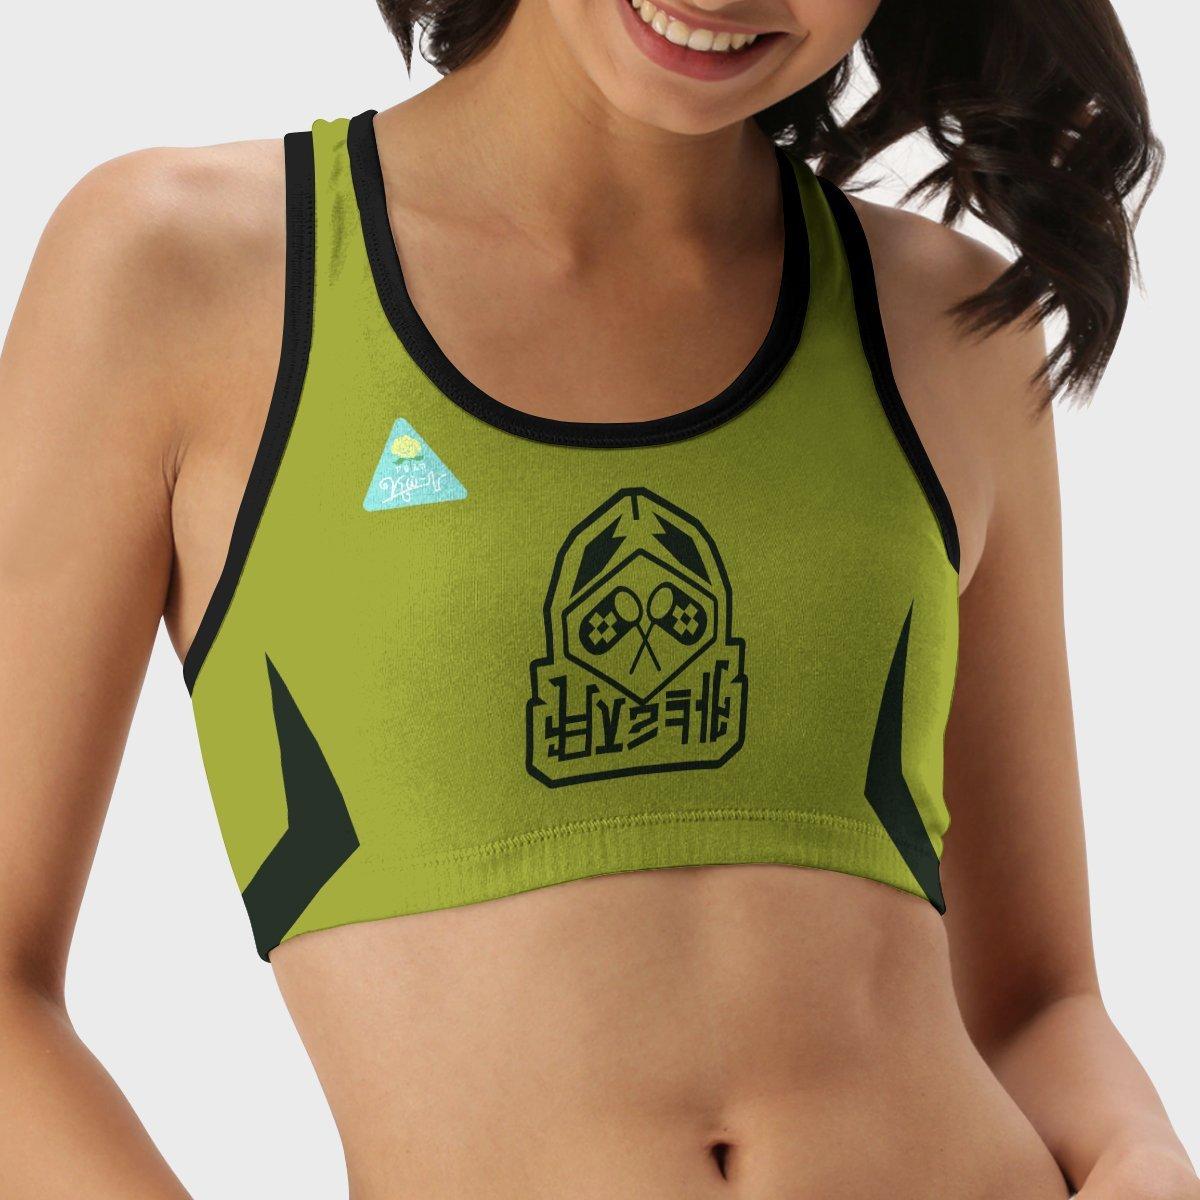 pokemon bug type active wear set 120055 - Anime Swimsuits